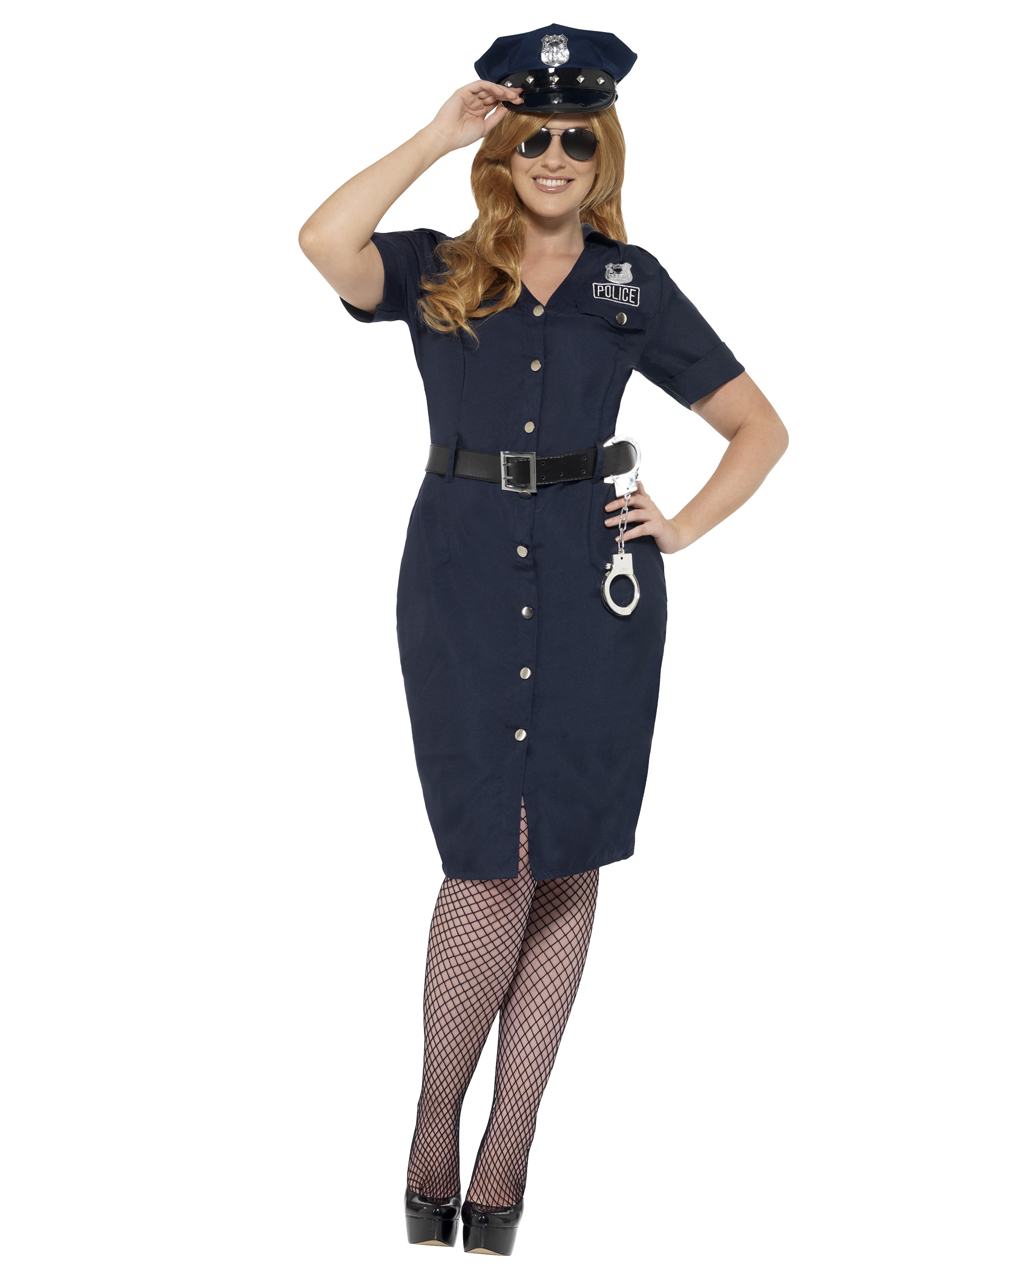 Kurvige Nyc Polizistin Plus Size Kostum Fur Fasching Horror Shop Com